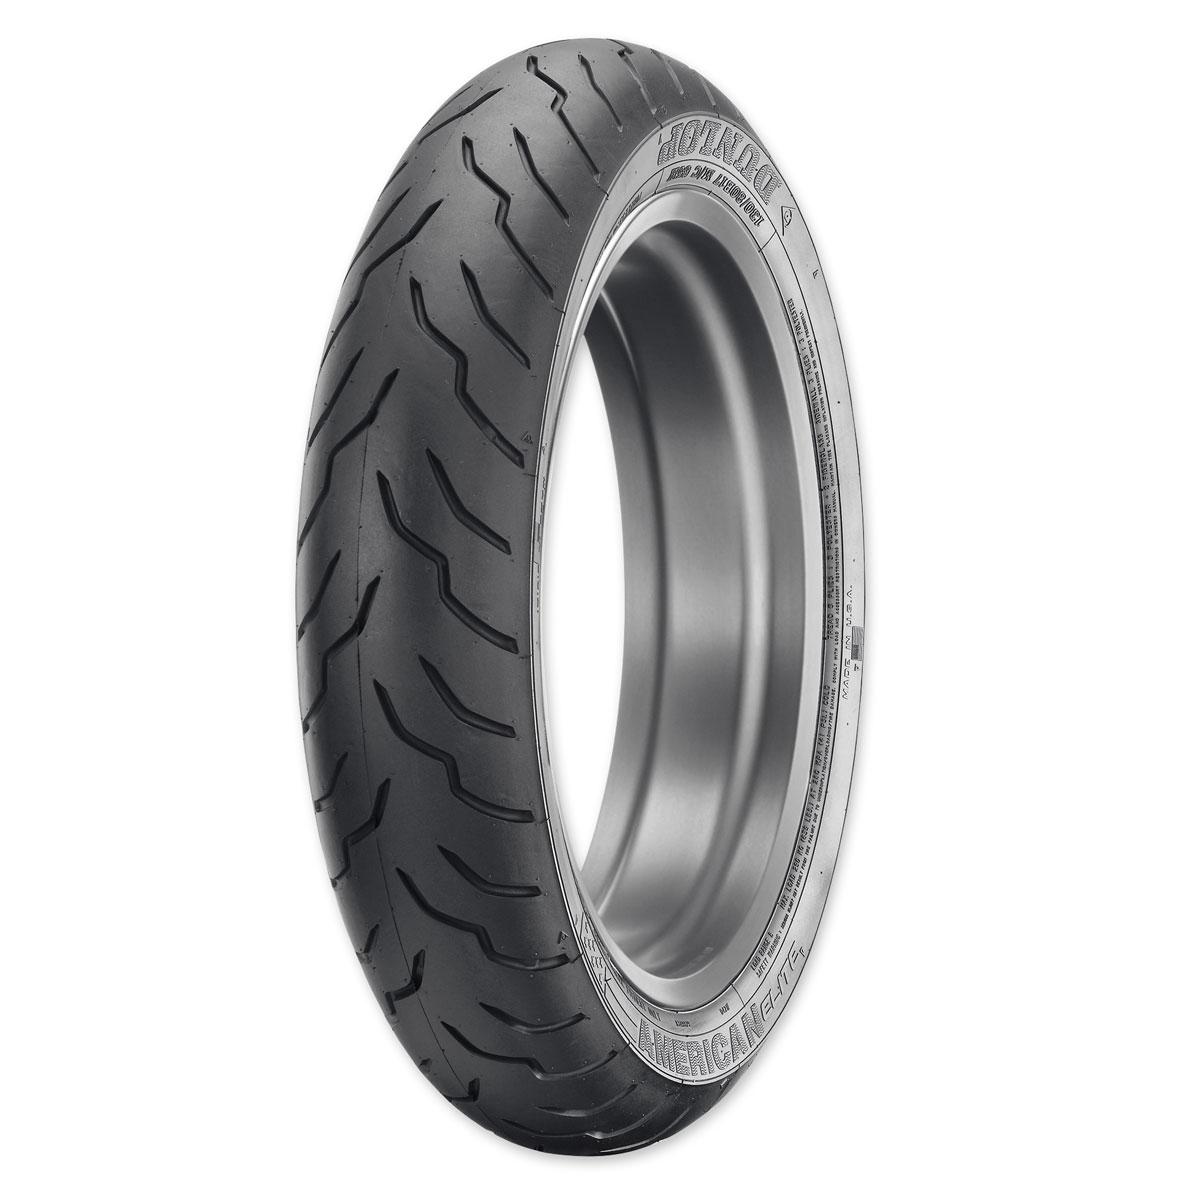 Dunlop American Elite 100/90-19 Front Tire